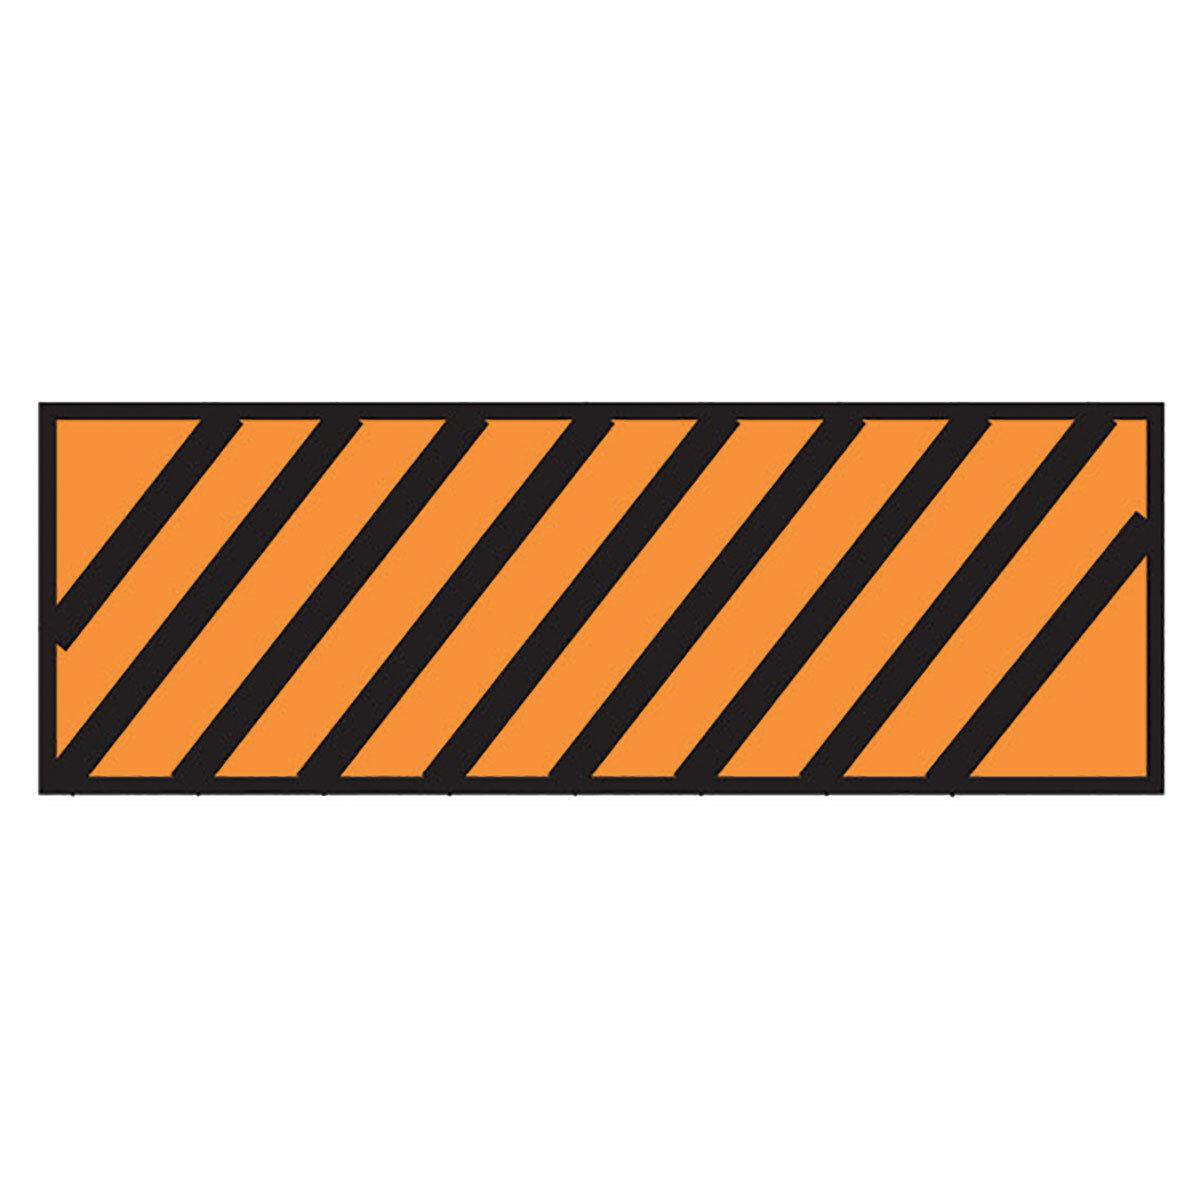 Surgical Instrument Identification Sheet Tape Diagonal